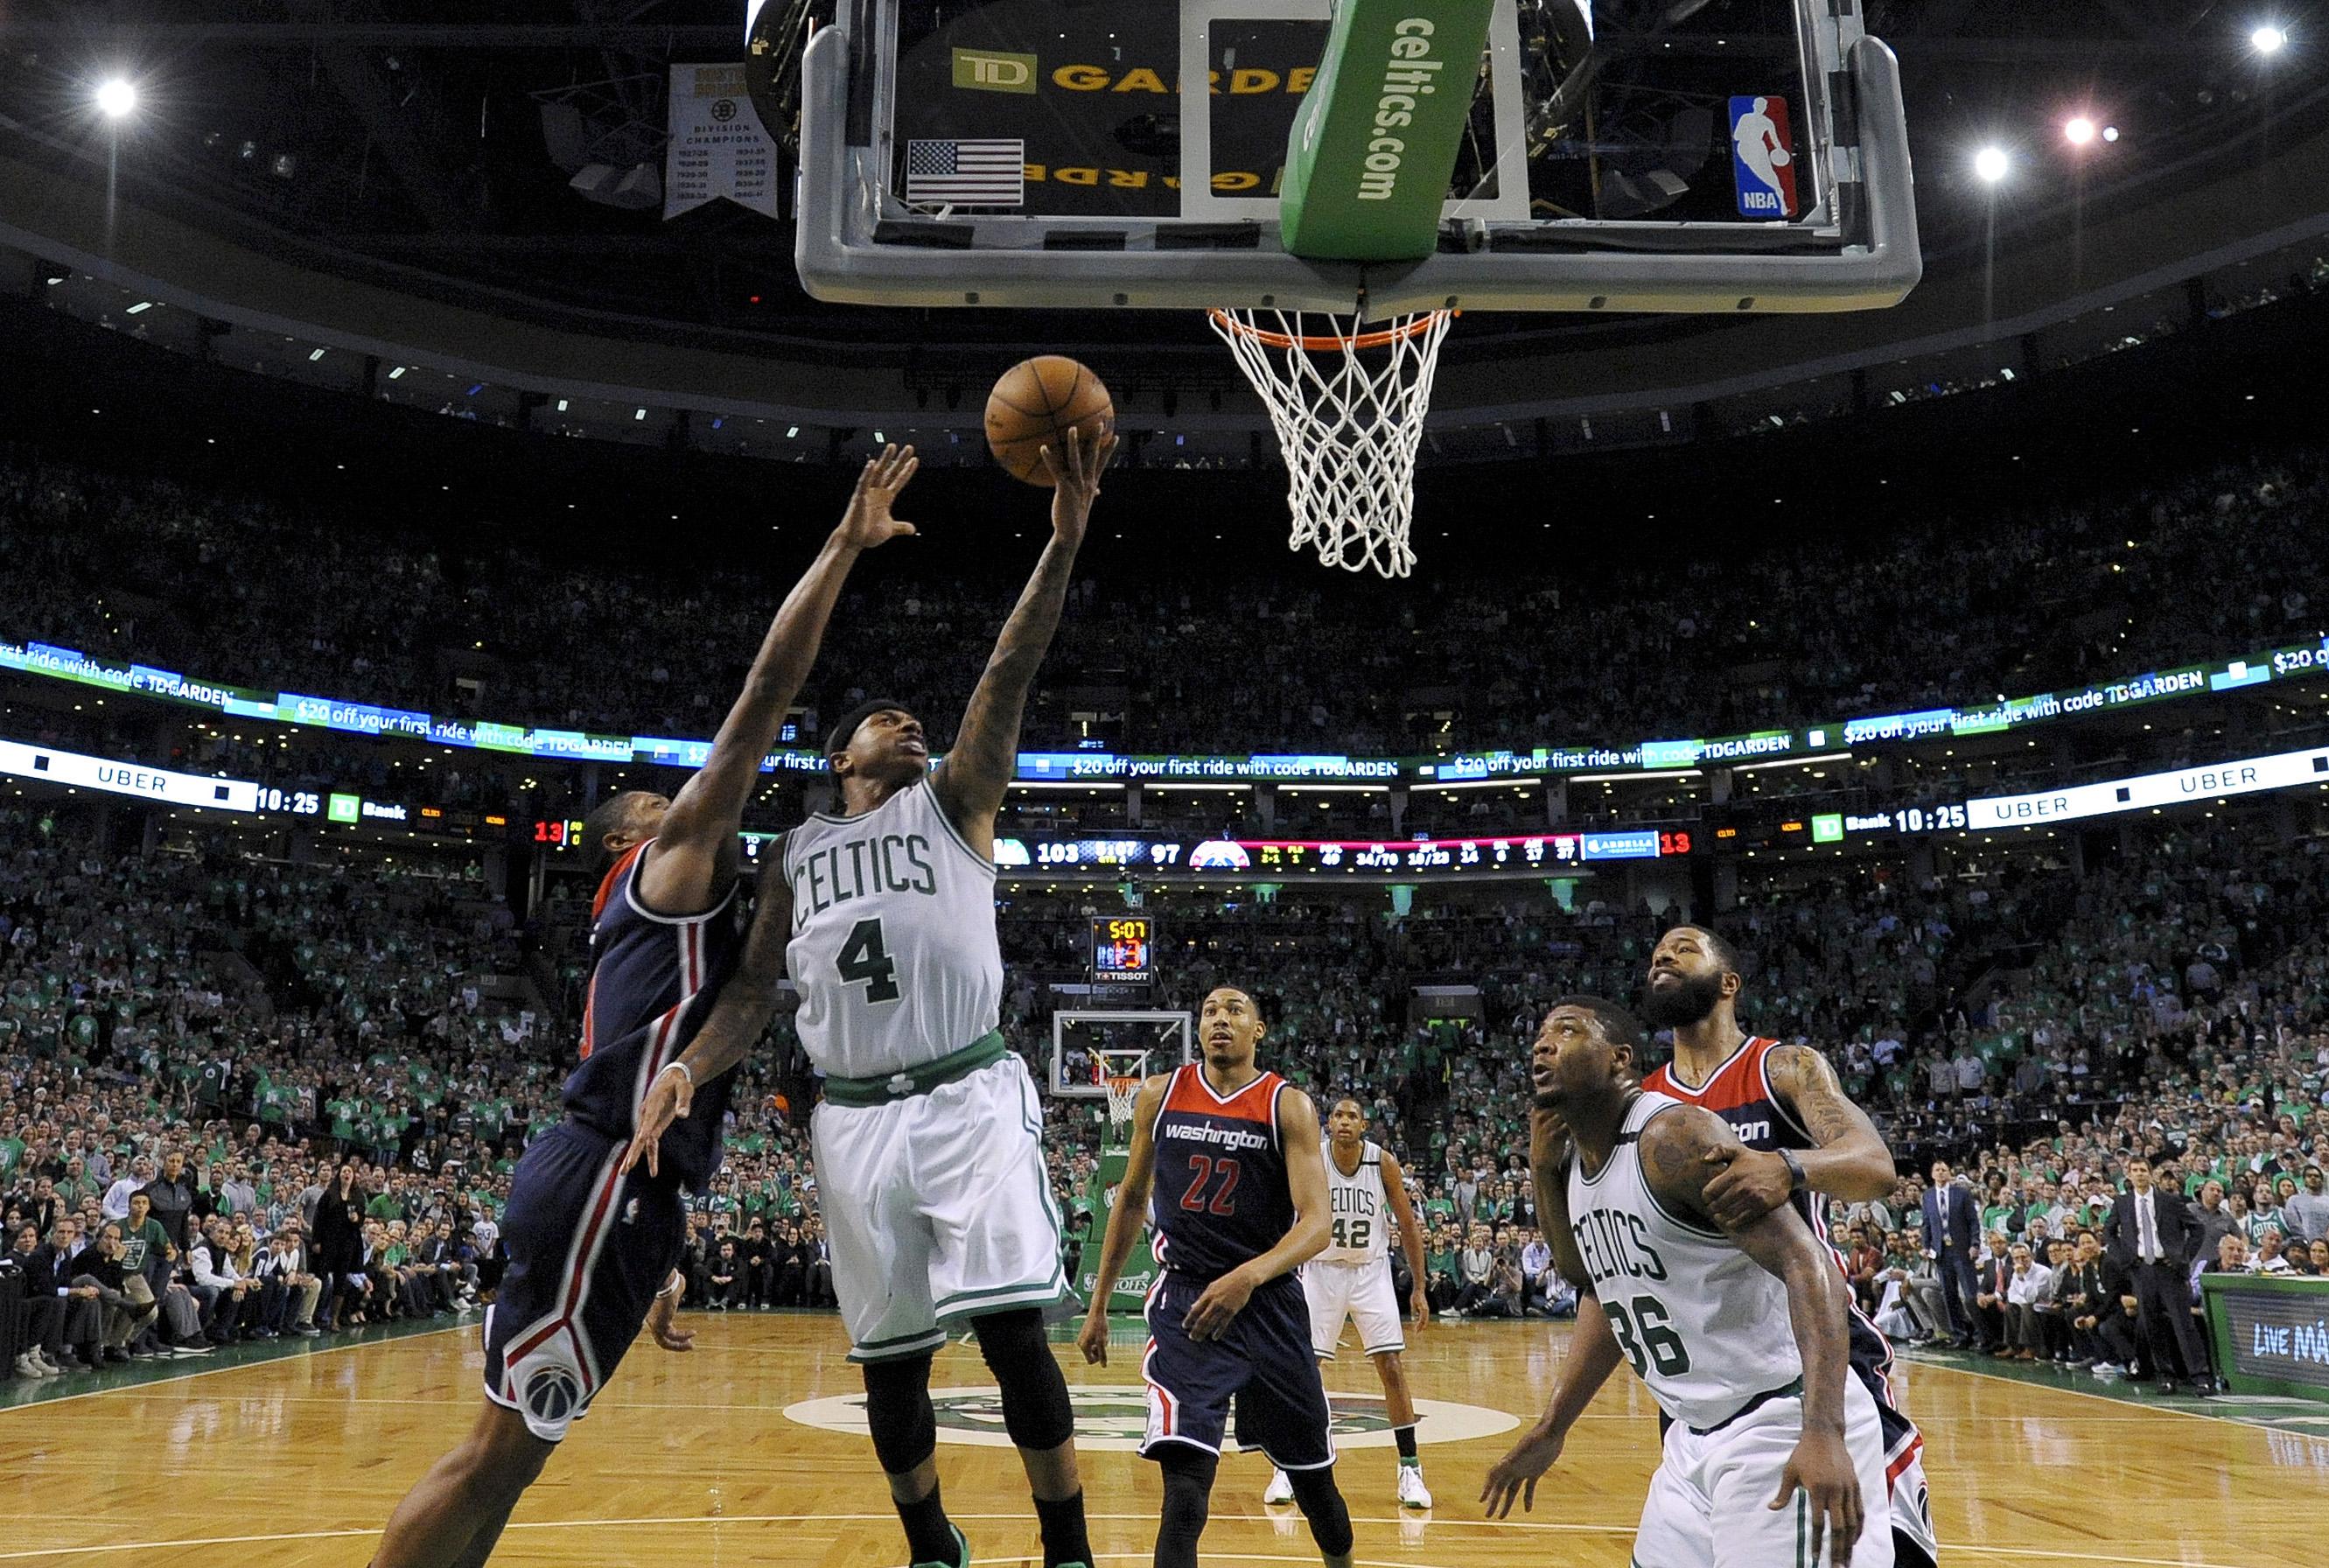 10059610-nba-playoffs-washington-wizards-at-boston-celtics